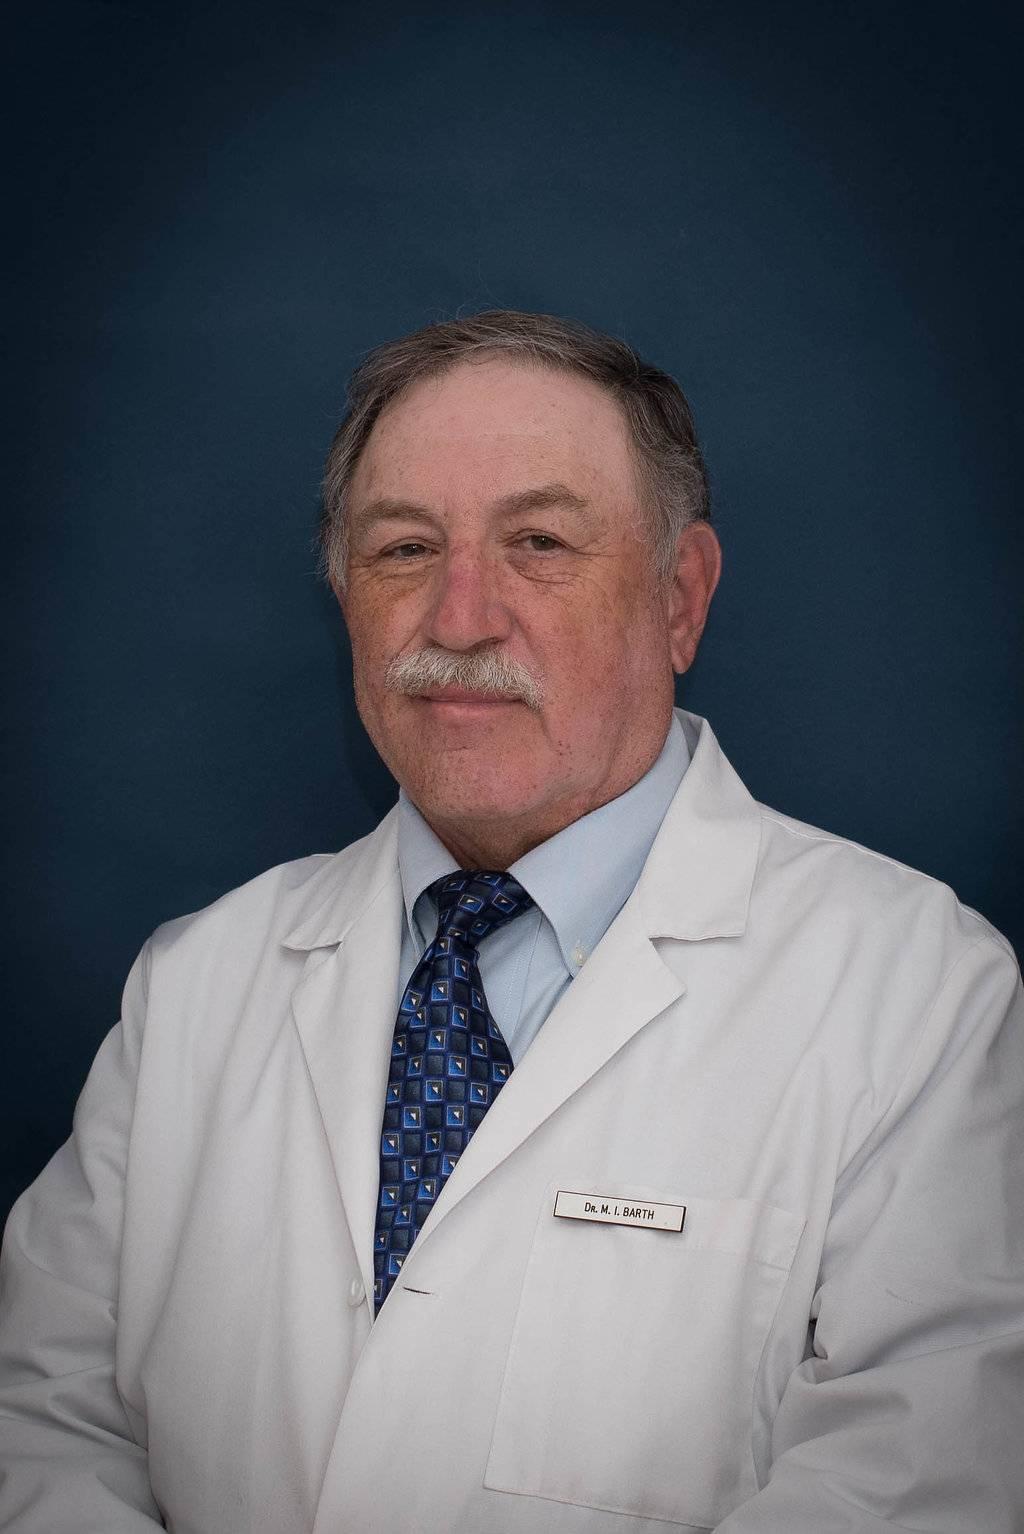 Dr.-Markus-Barth-1